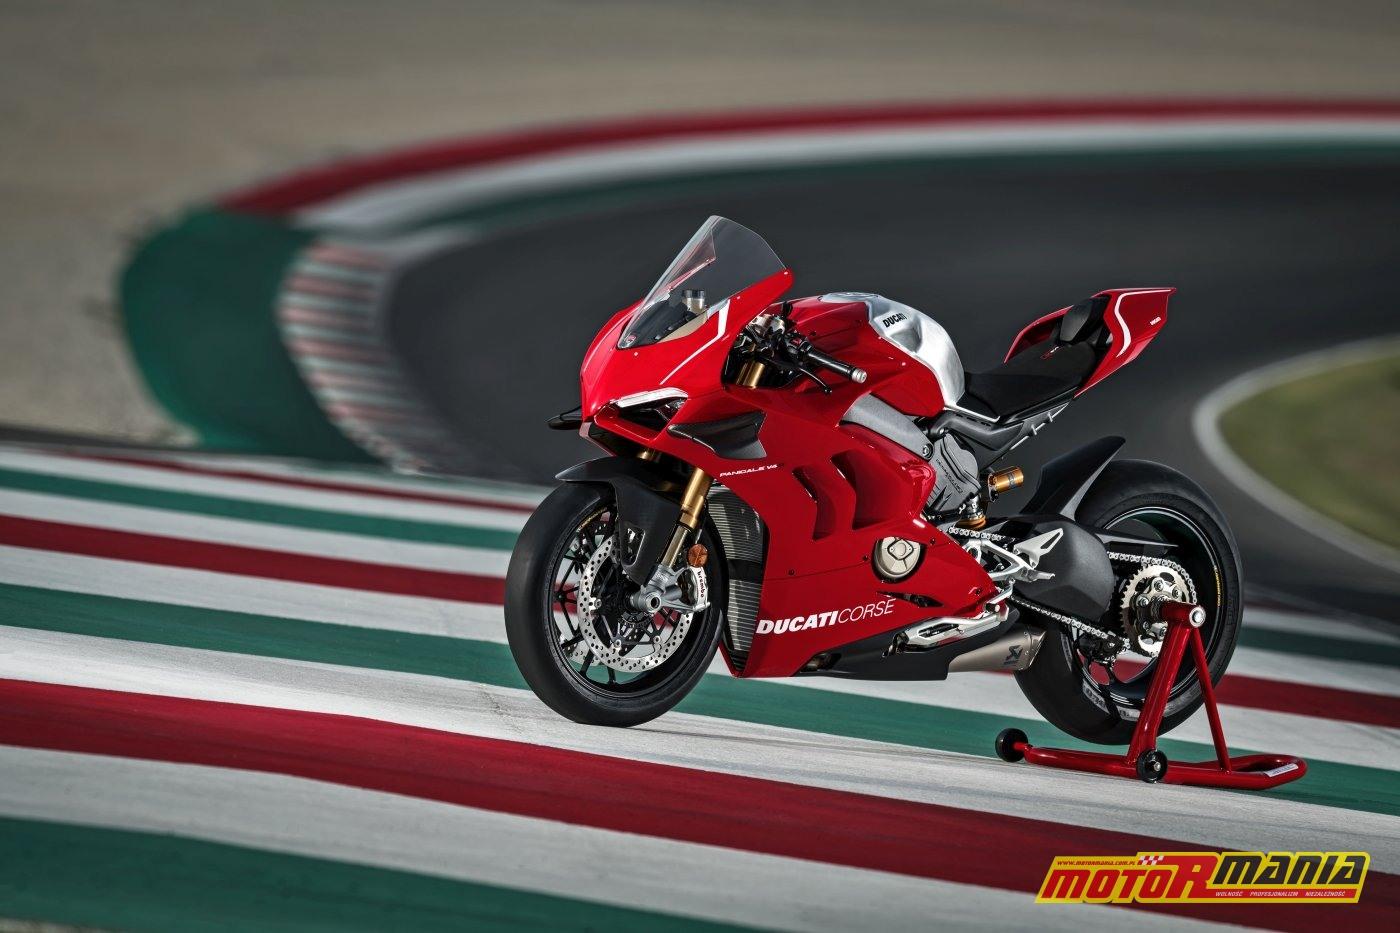 Ducati Panigale V4 R 2019 (2)